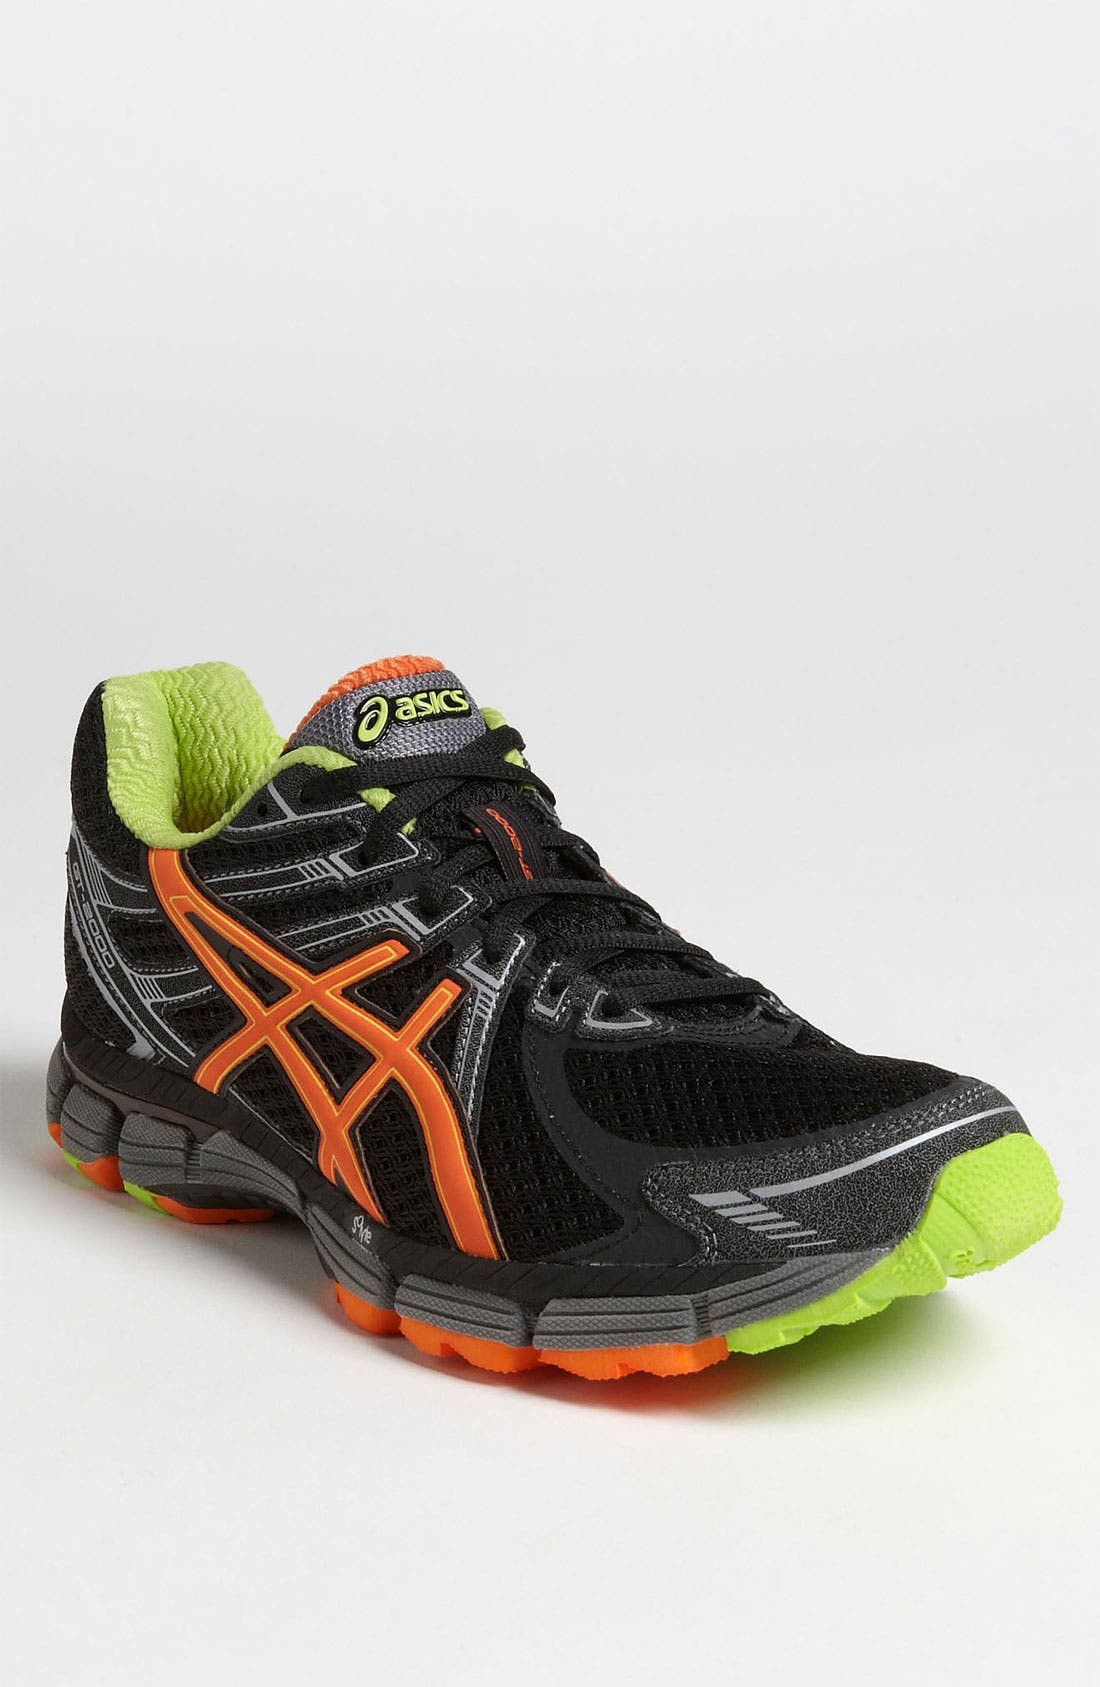 Alternate Image 1 Selected - ASICS® 'GT 2000' Trail Running Shoe (Men) (Online Only)